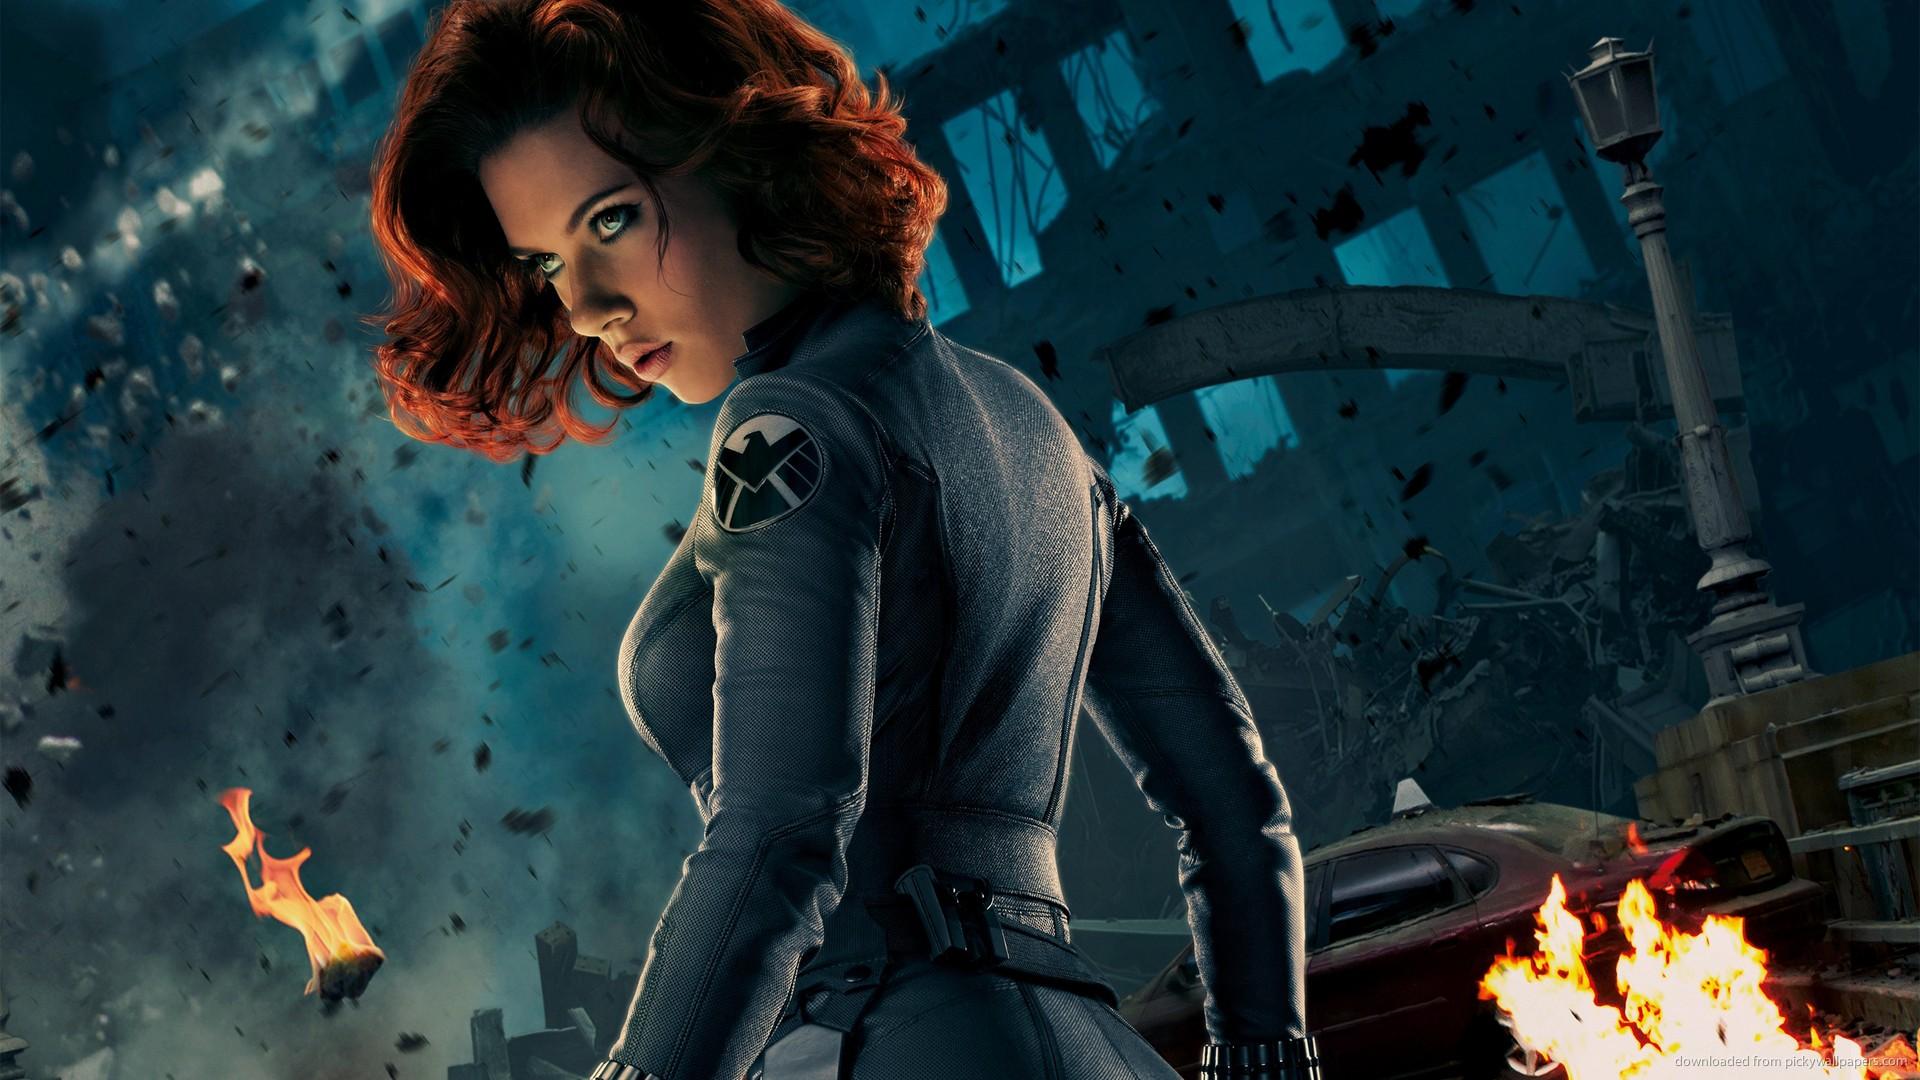 Scarlett Johansson Wallpaper Black Widow 717271 1920x1080